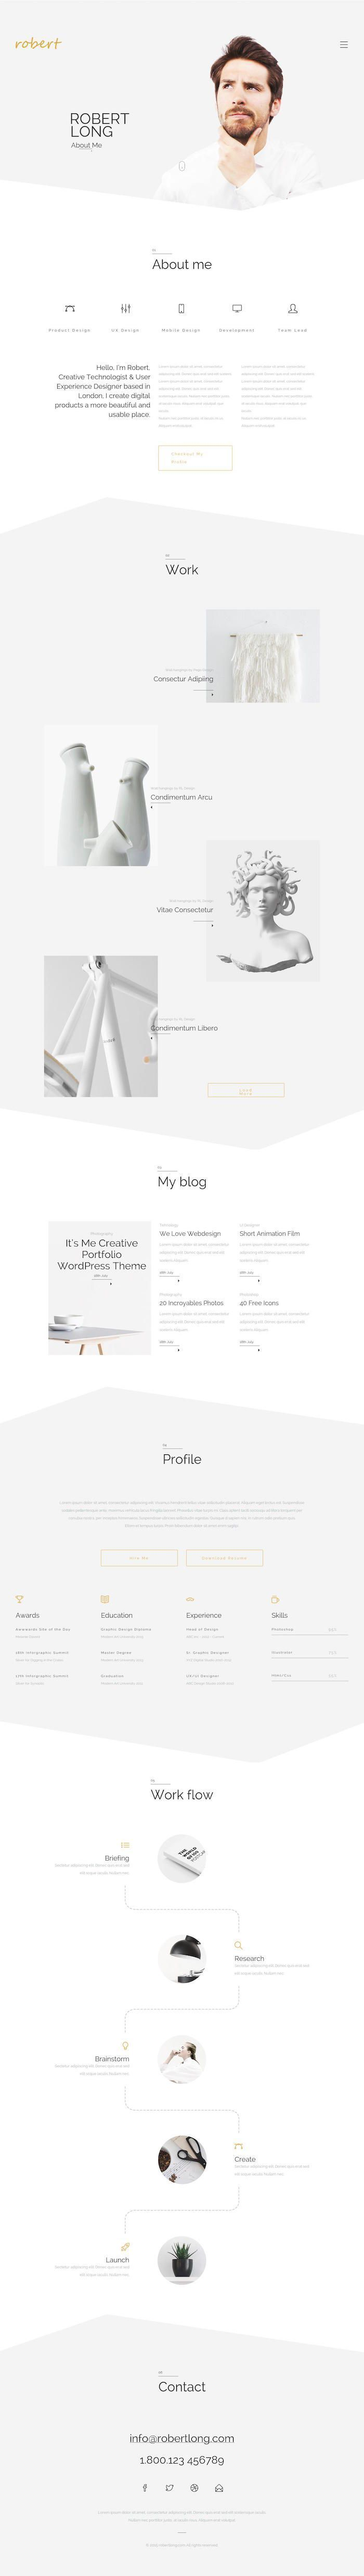 It's Me | Creative personal portfolio website design